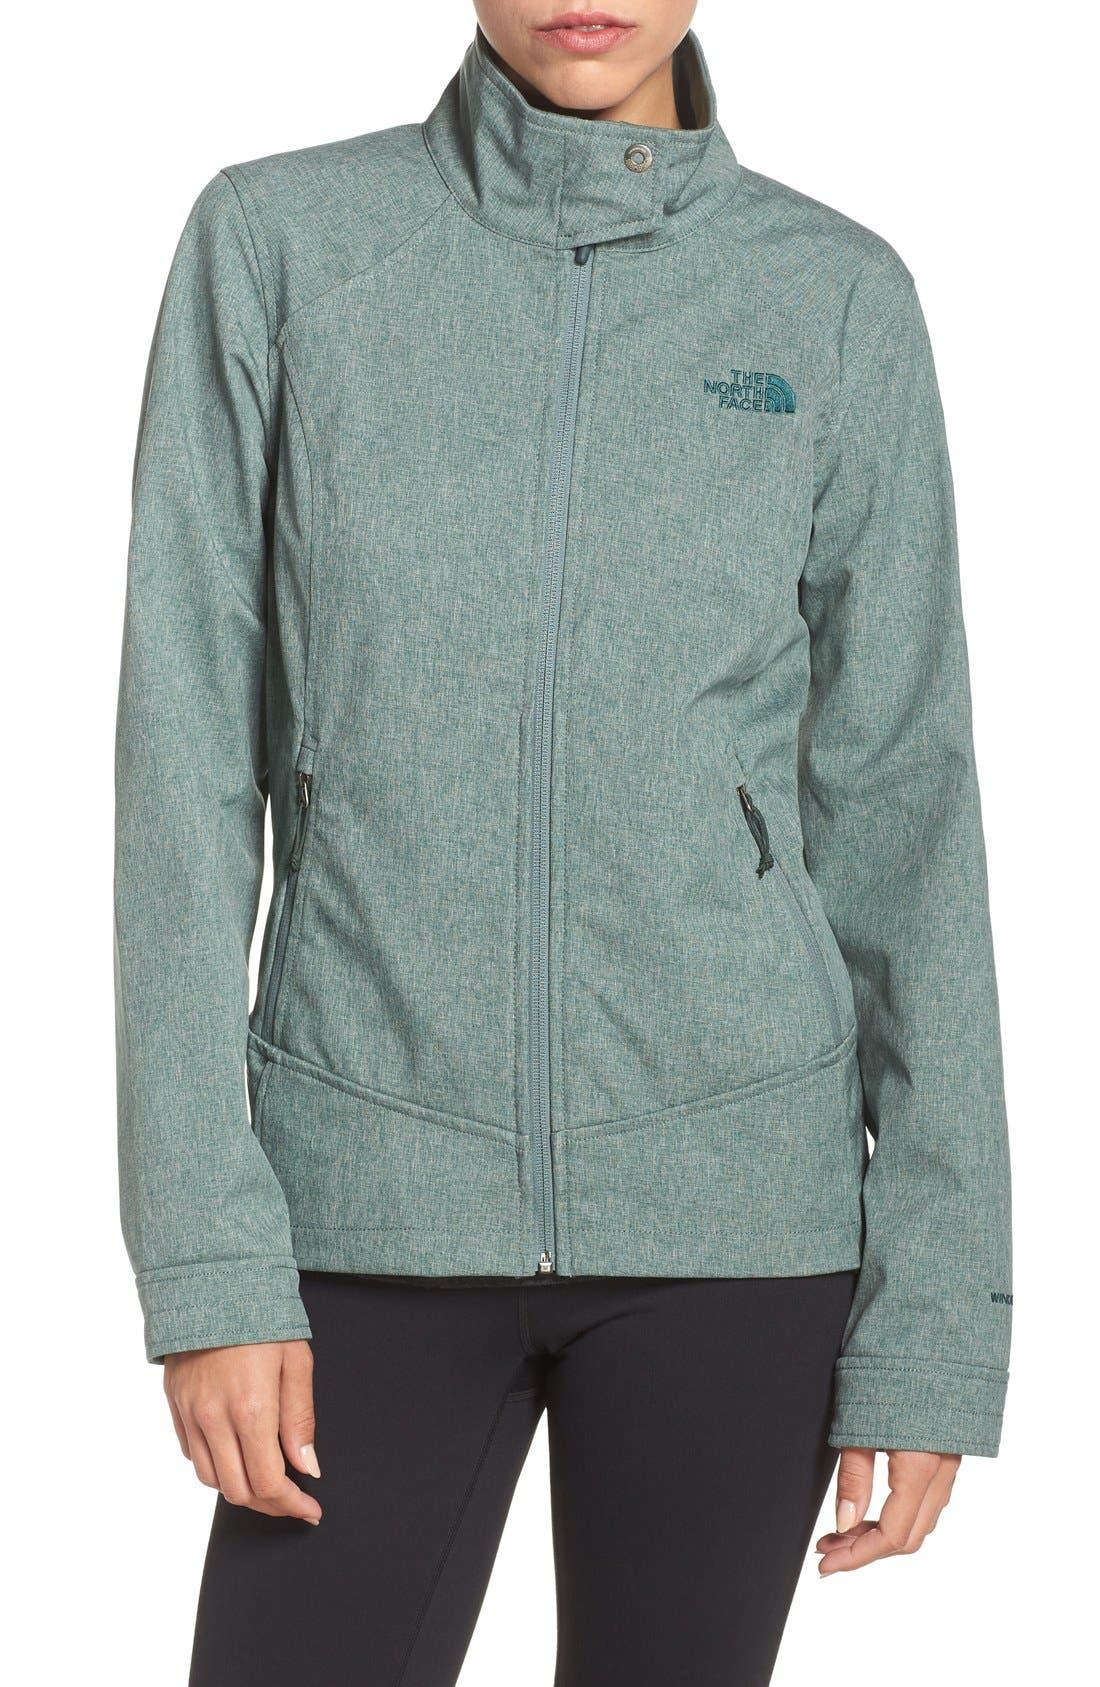 Main Image - The North Face 'Calentito 2' Soft Shell Jacket